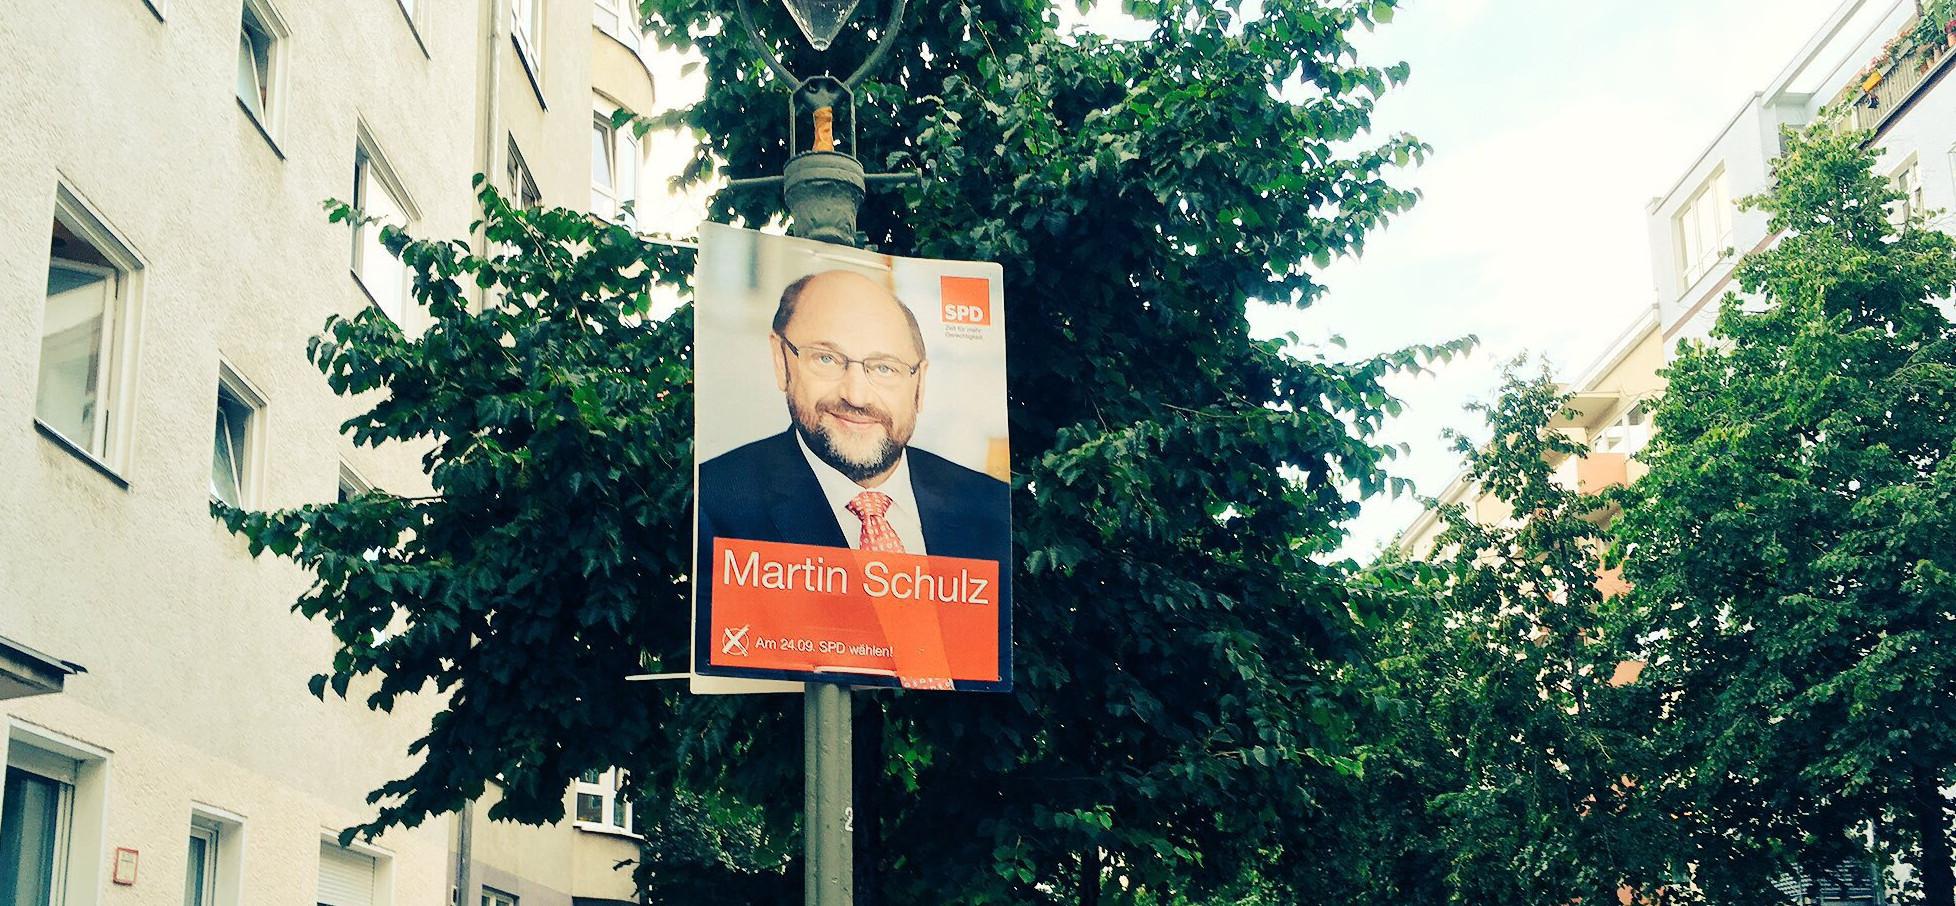 Cartel electoral Martin Schulz